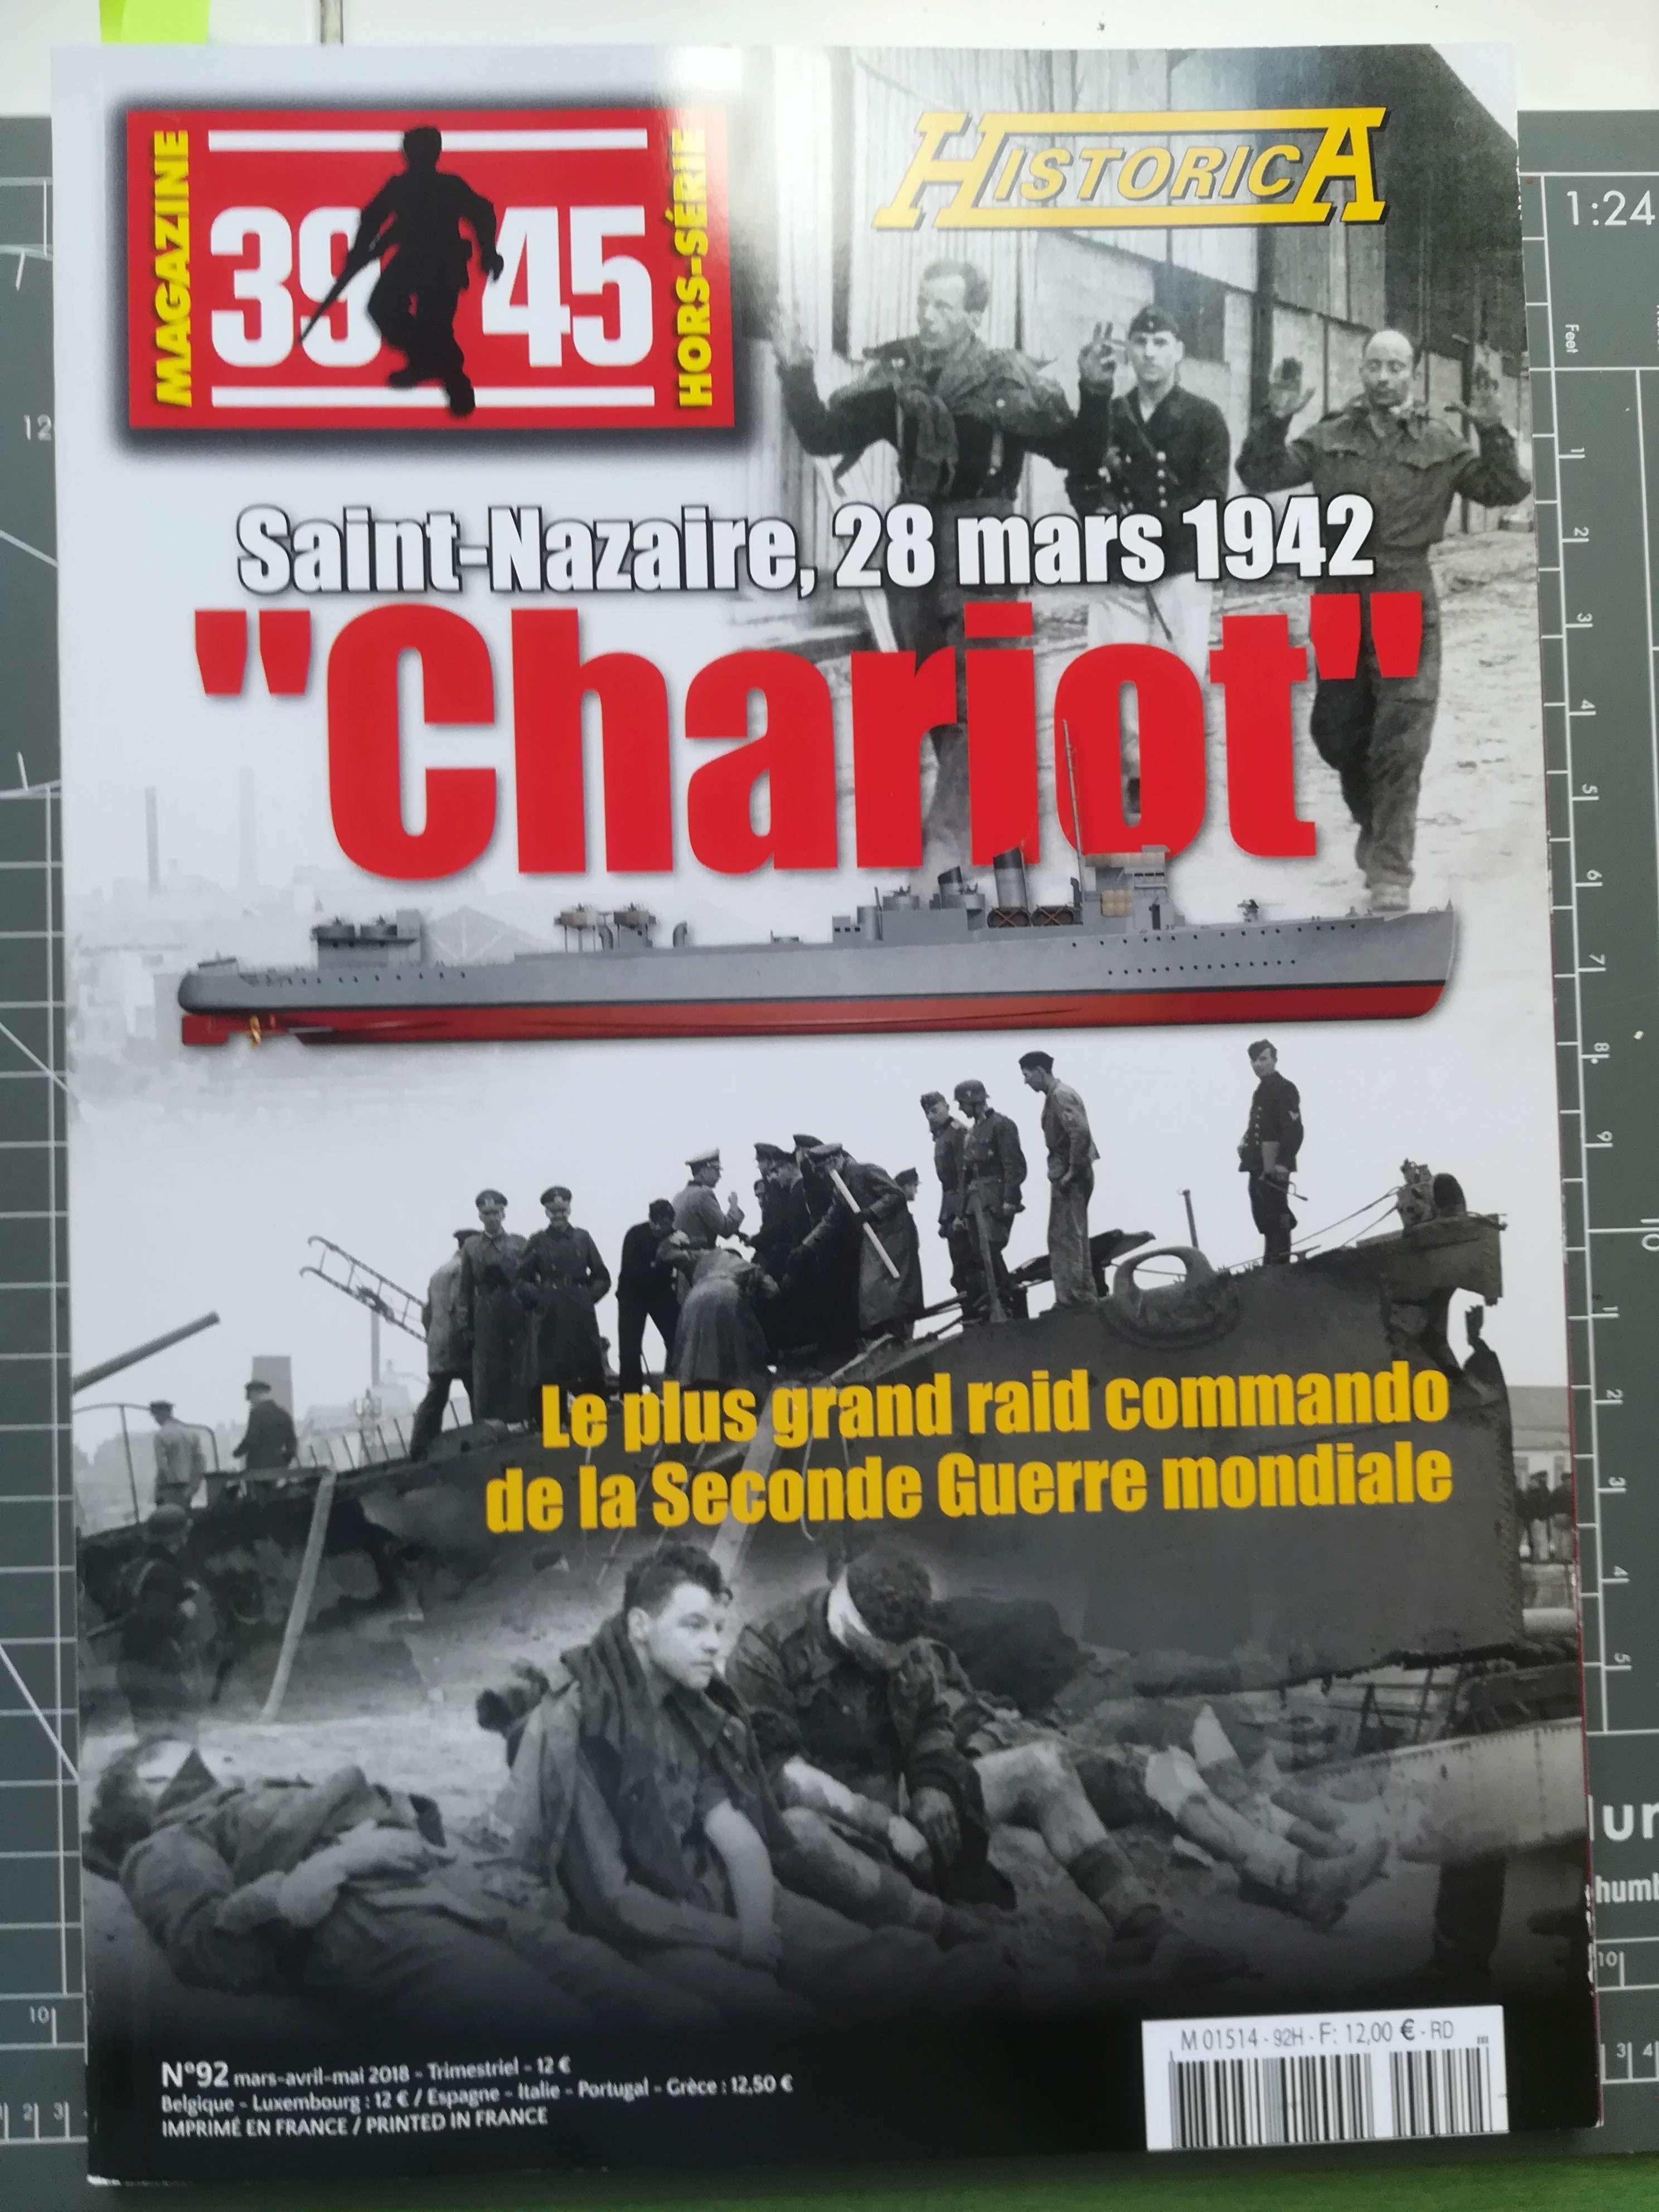 "Opération ""Chariot"" - Saint Nazaire 28 mars 1942 (Vosper MTB 74 - Italeri 1/35) Img_1569"